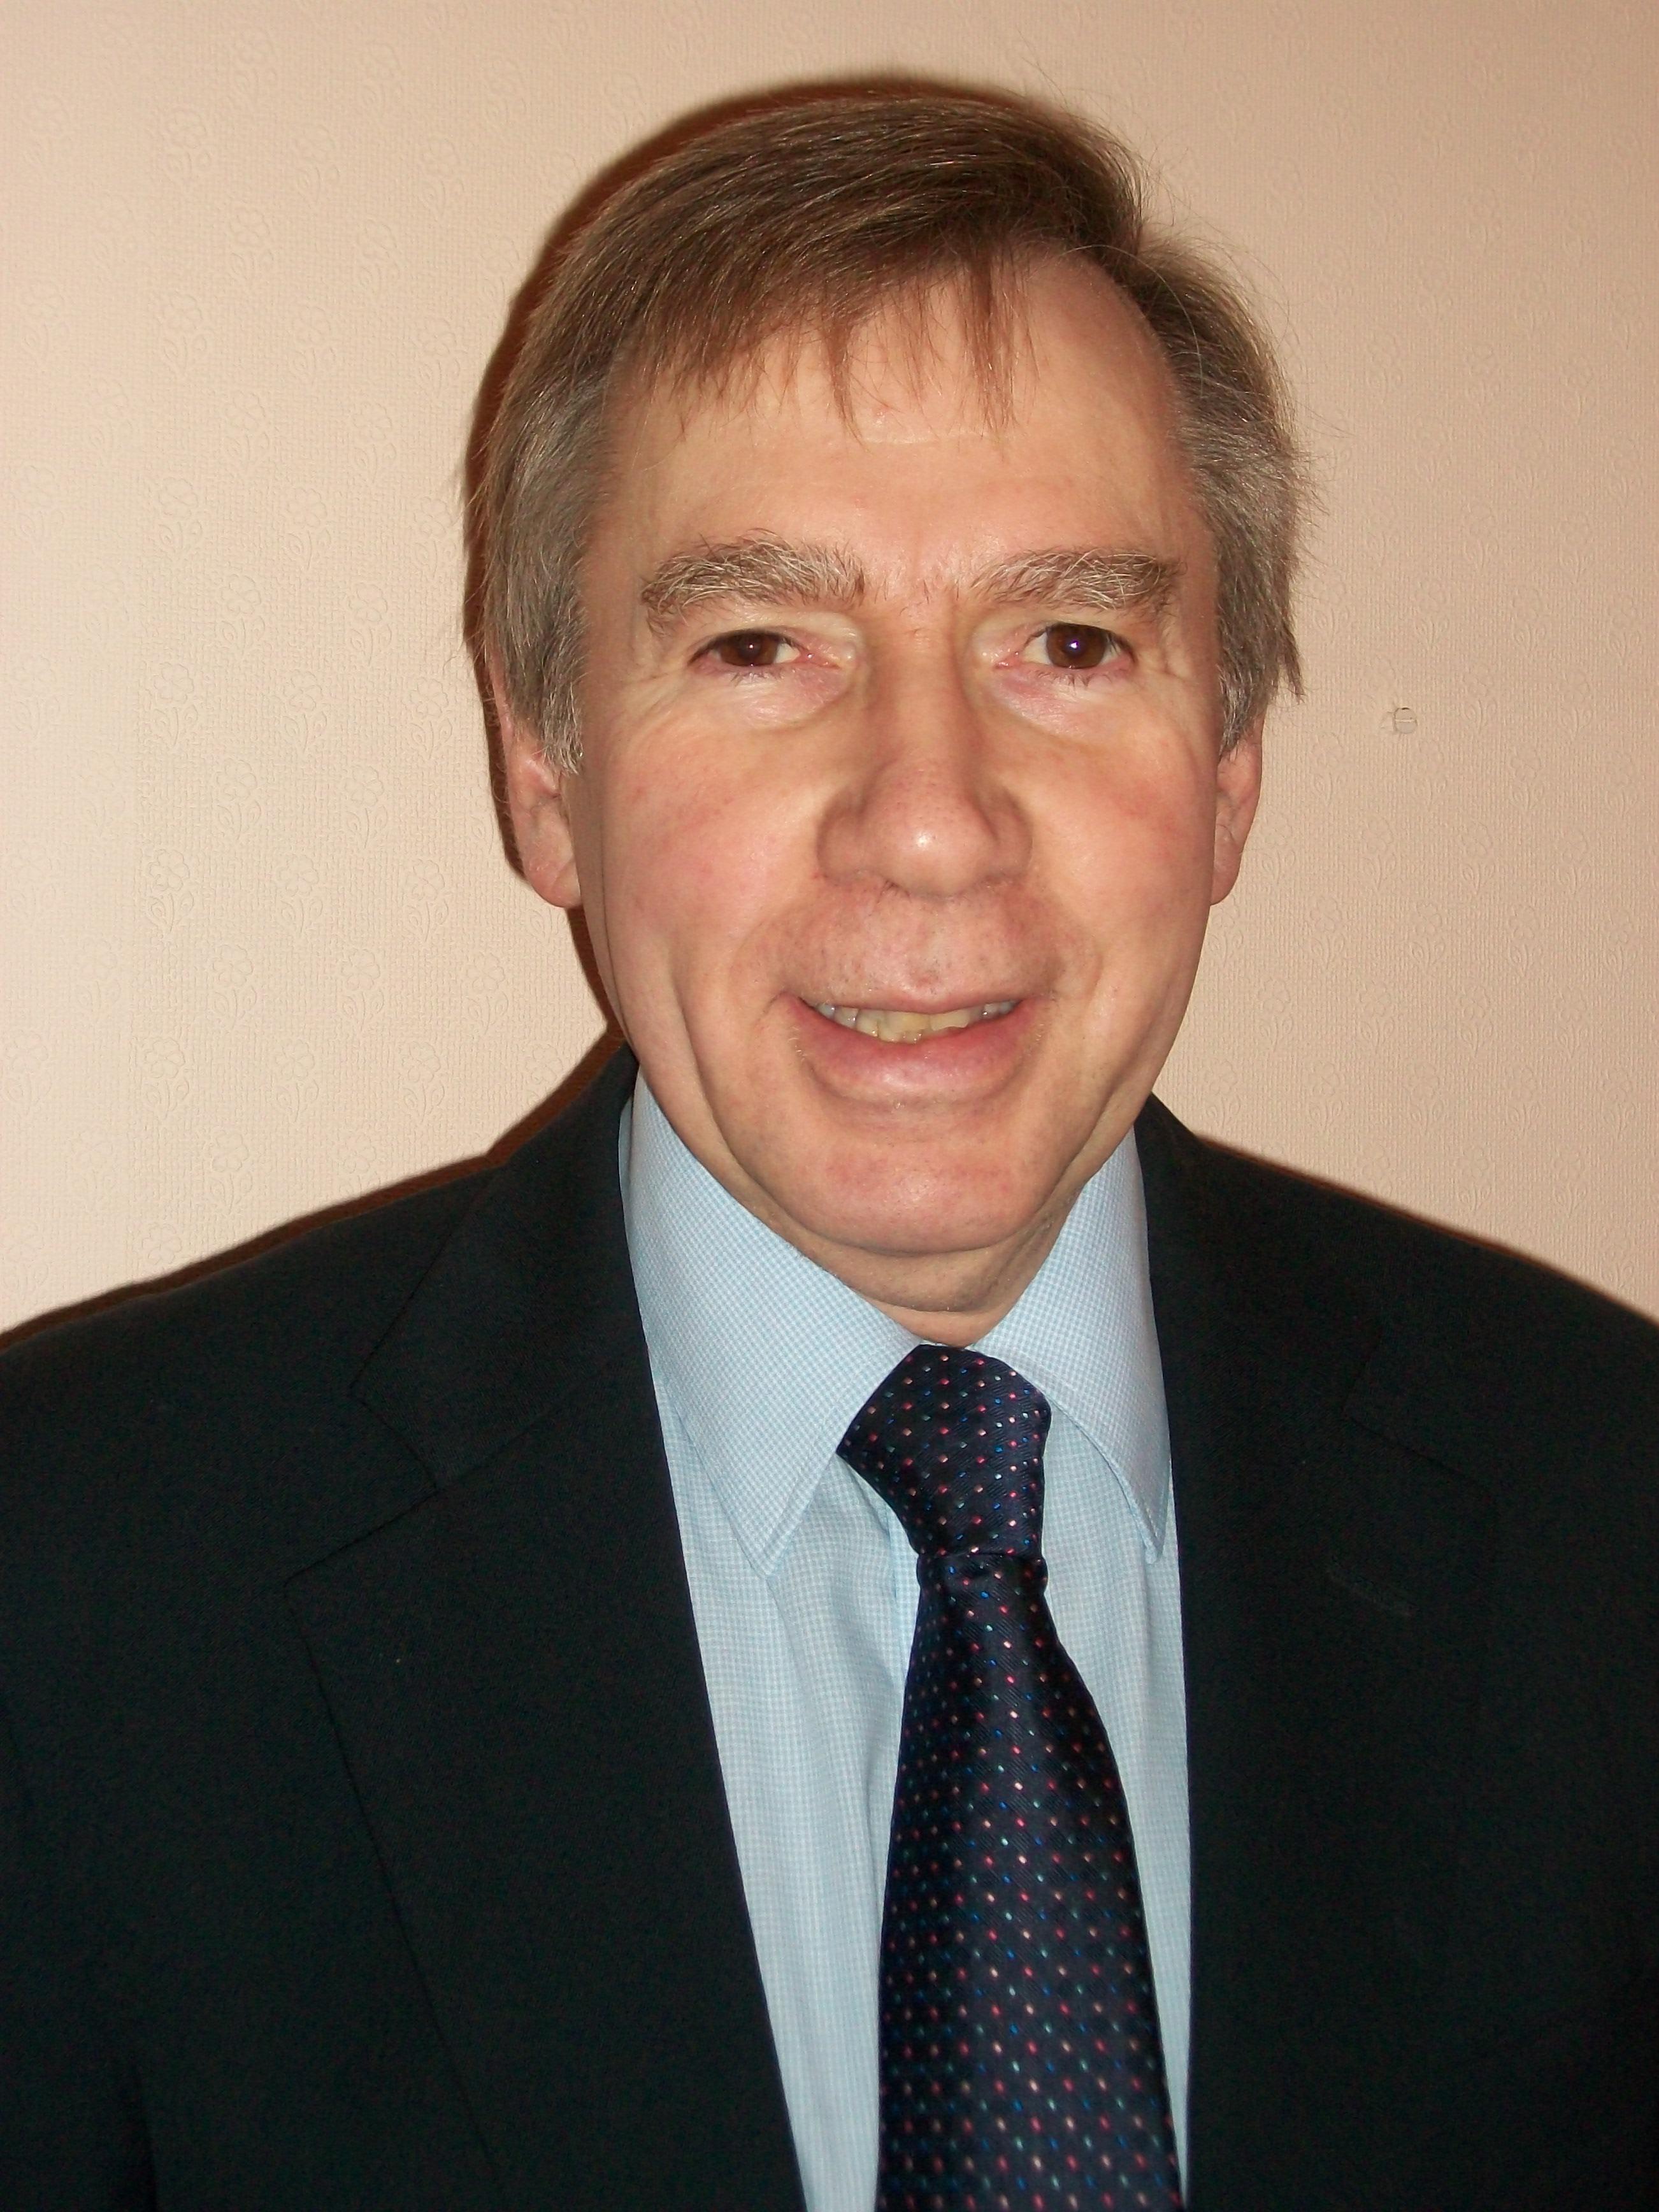 Brian Godman